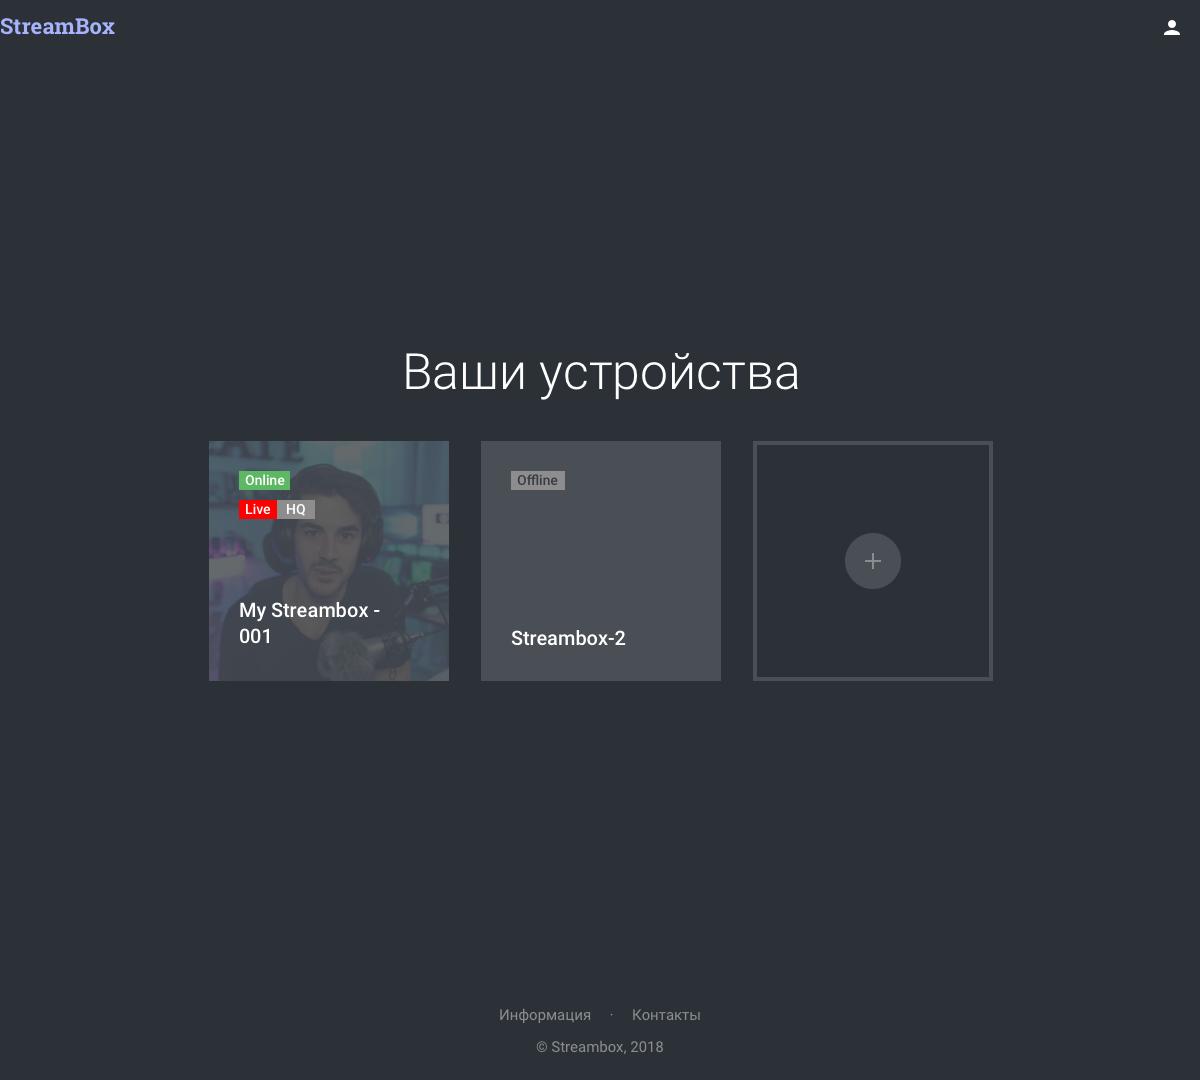 Интерфейс энкодер онлайн-трансляции